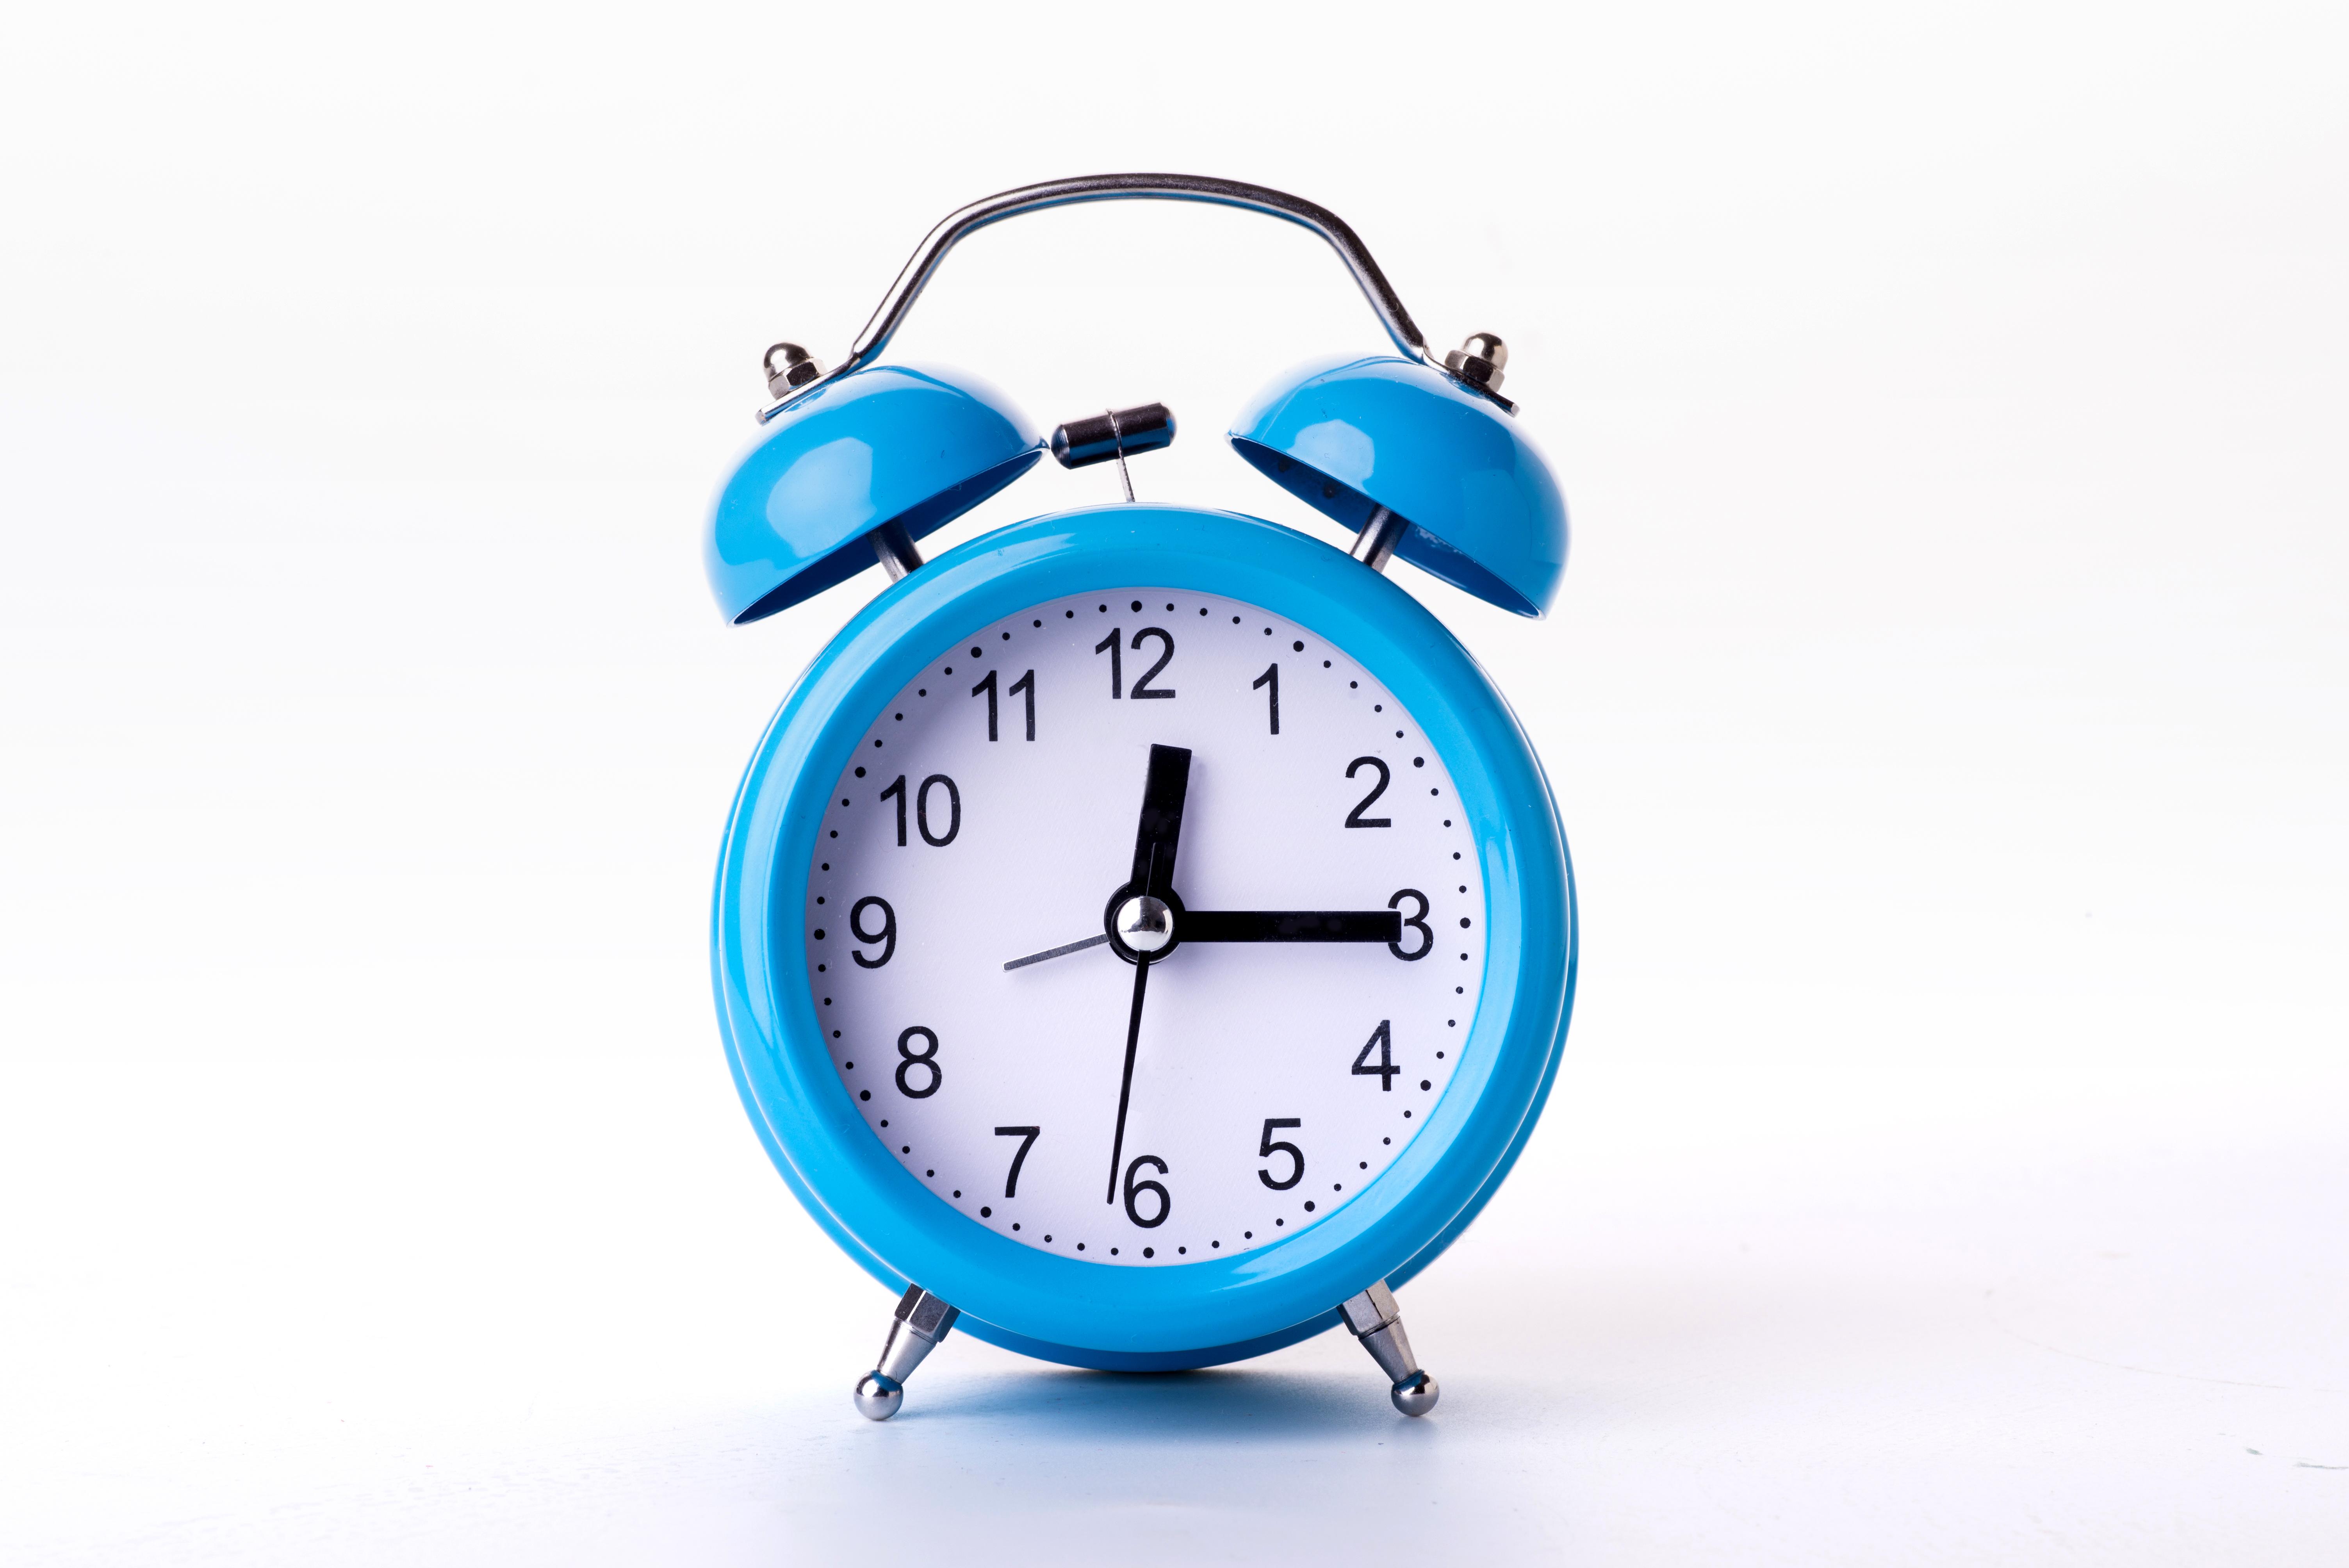 blue-alarm-clock-on-white-background.jpg